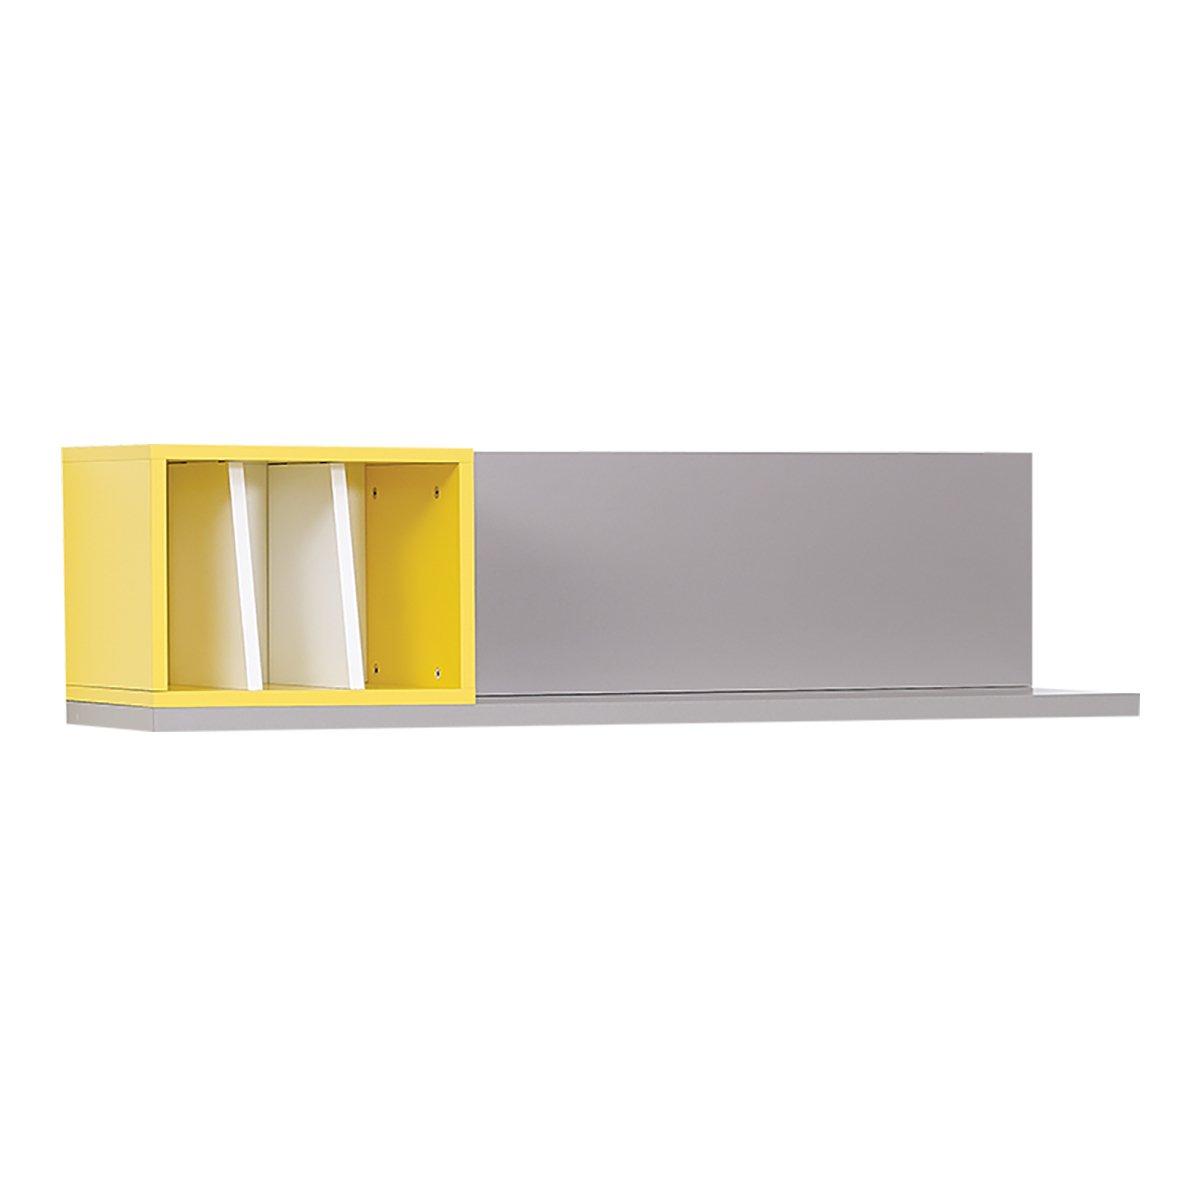 Almila Design Wandregal in Grau und Gelb Vector